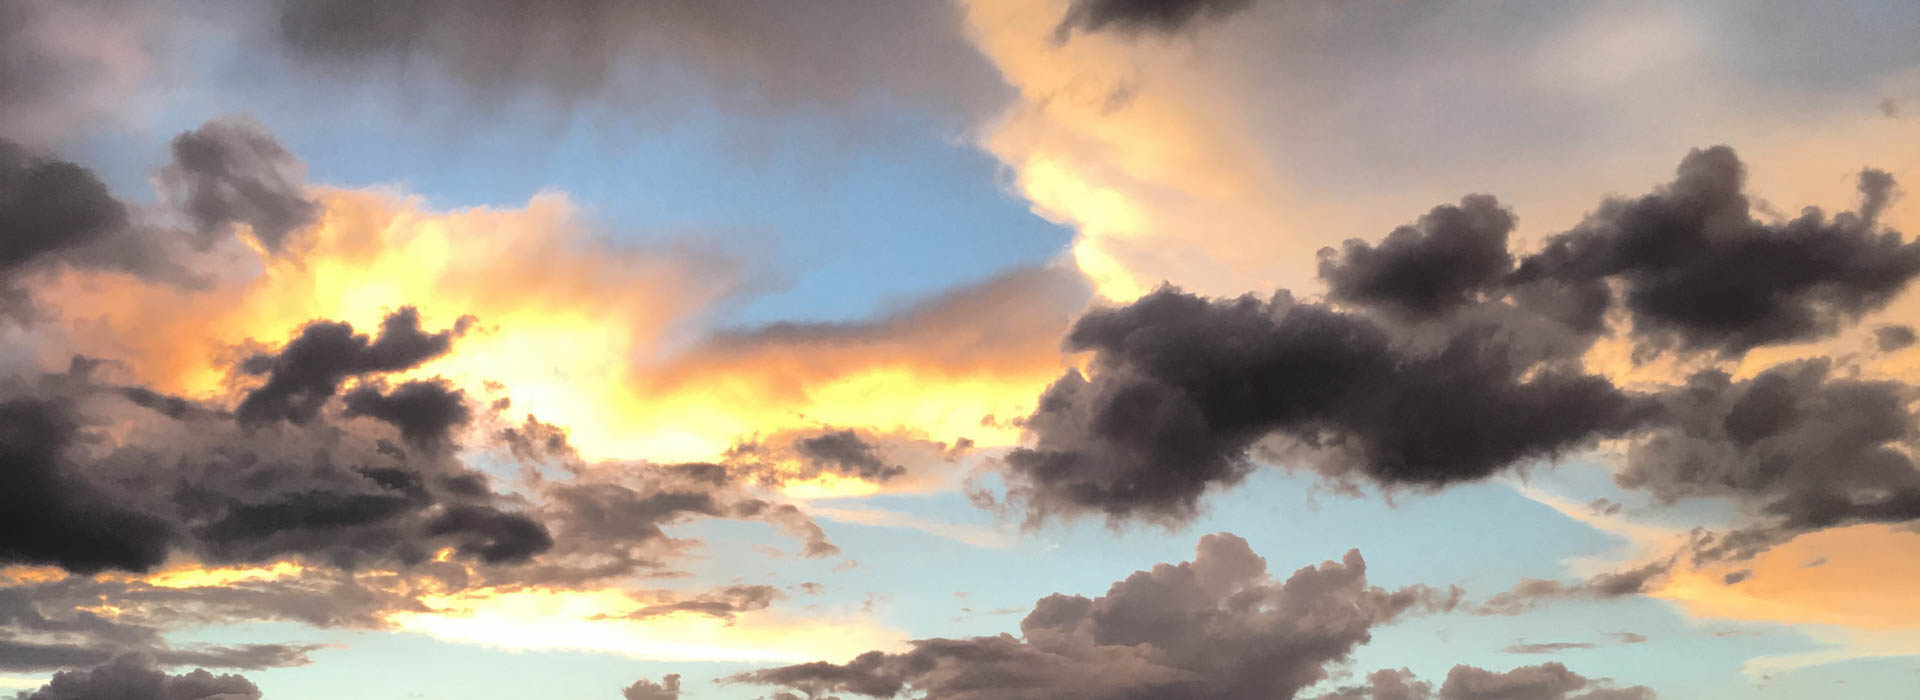 Monsoons bring stunning sunrises and sunsets in Prescott AZ